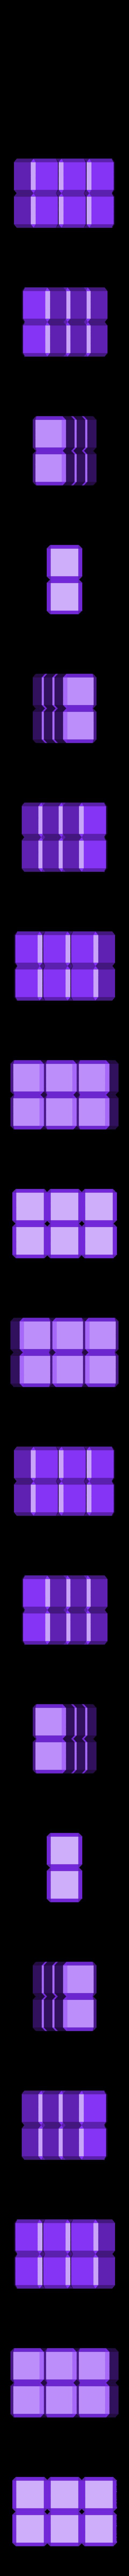 3x2x1.stl Download free STL file Cube Puzzle: 5 x 5 x 5, Five-Piece Dissection • 3D print model, LGBU